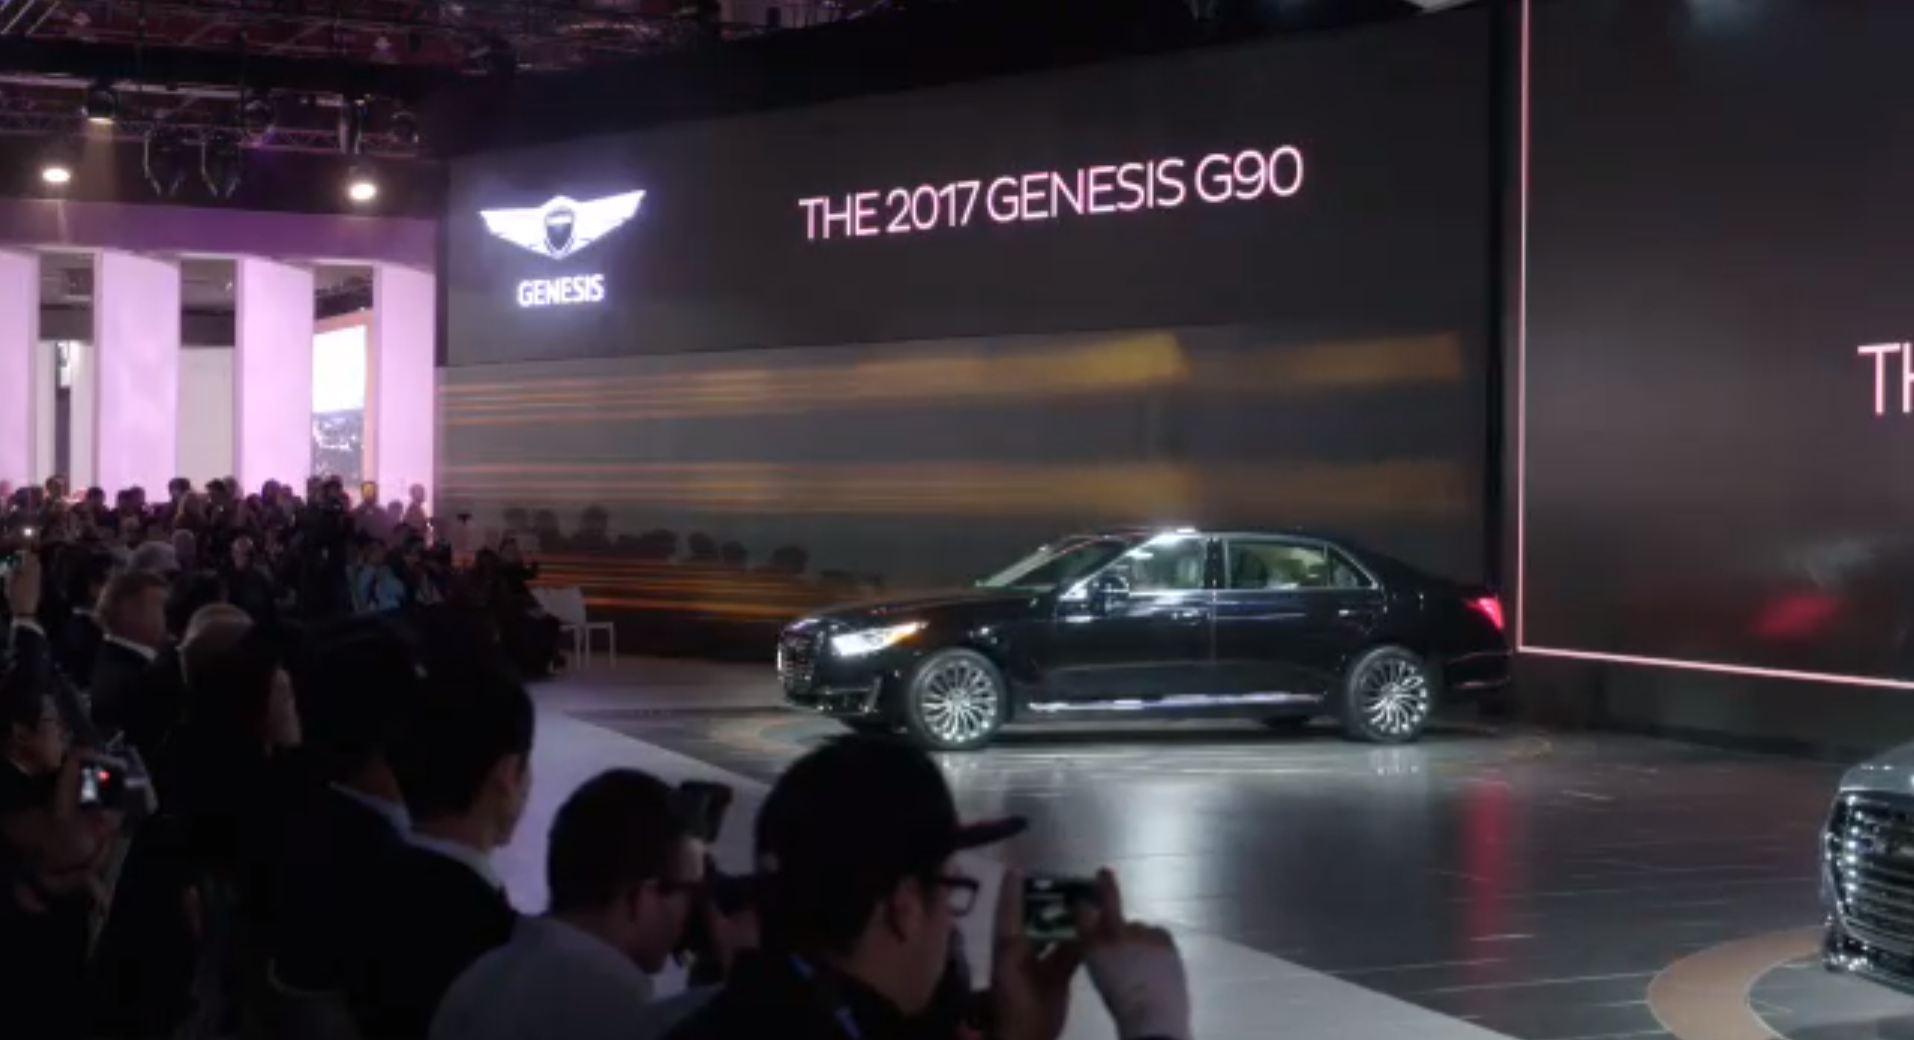 New Hyundai Genesis >> Genesis G90 Debut Takes Center Stage at Hyundai's NAIAS